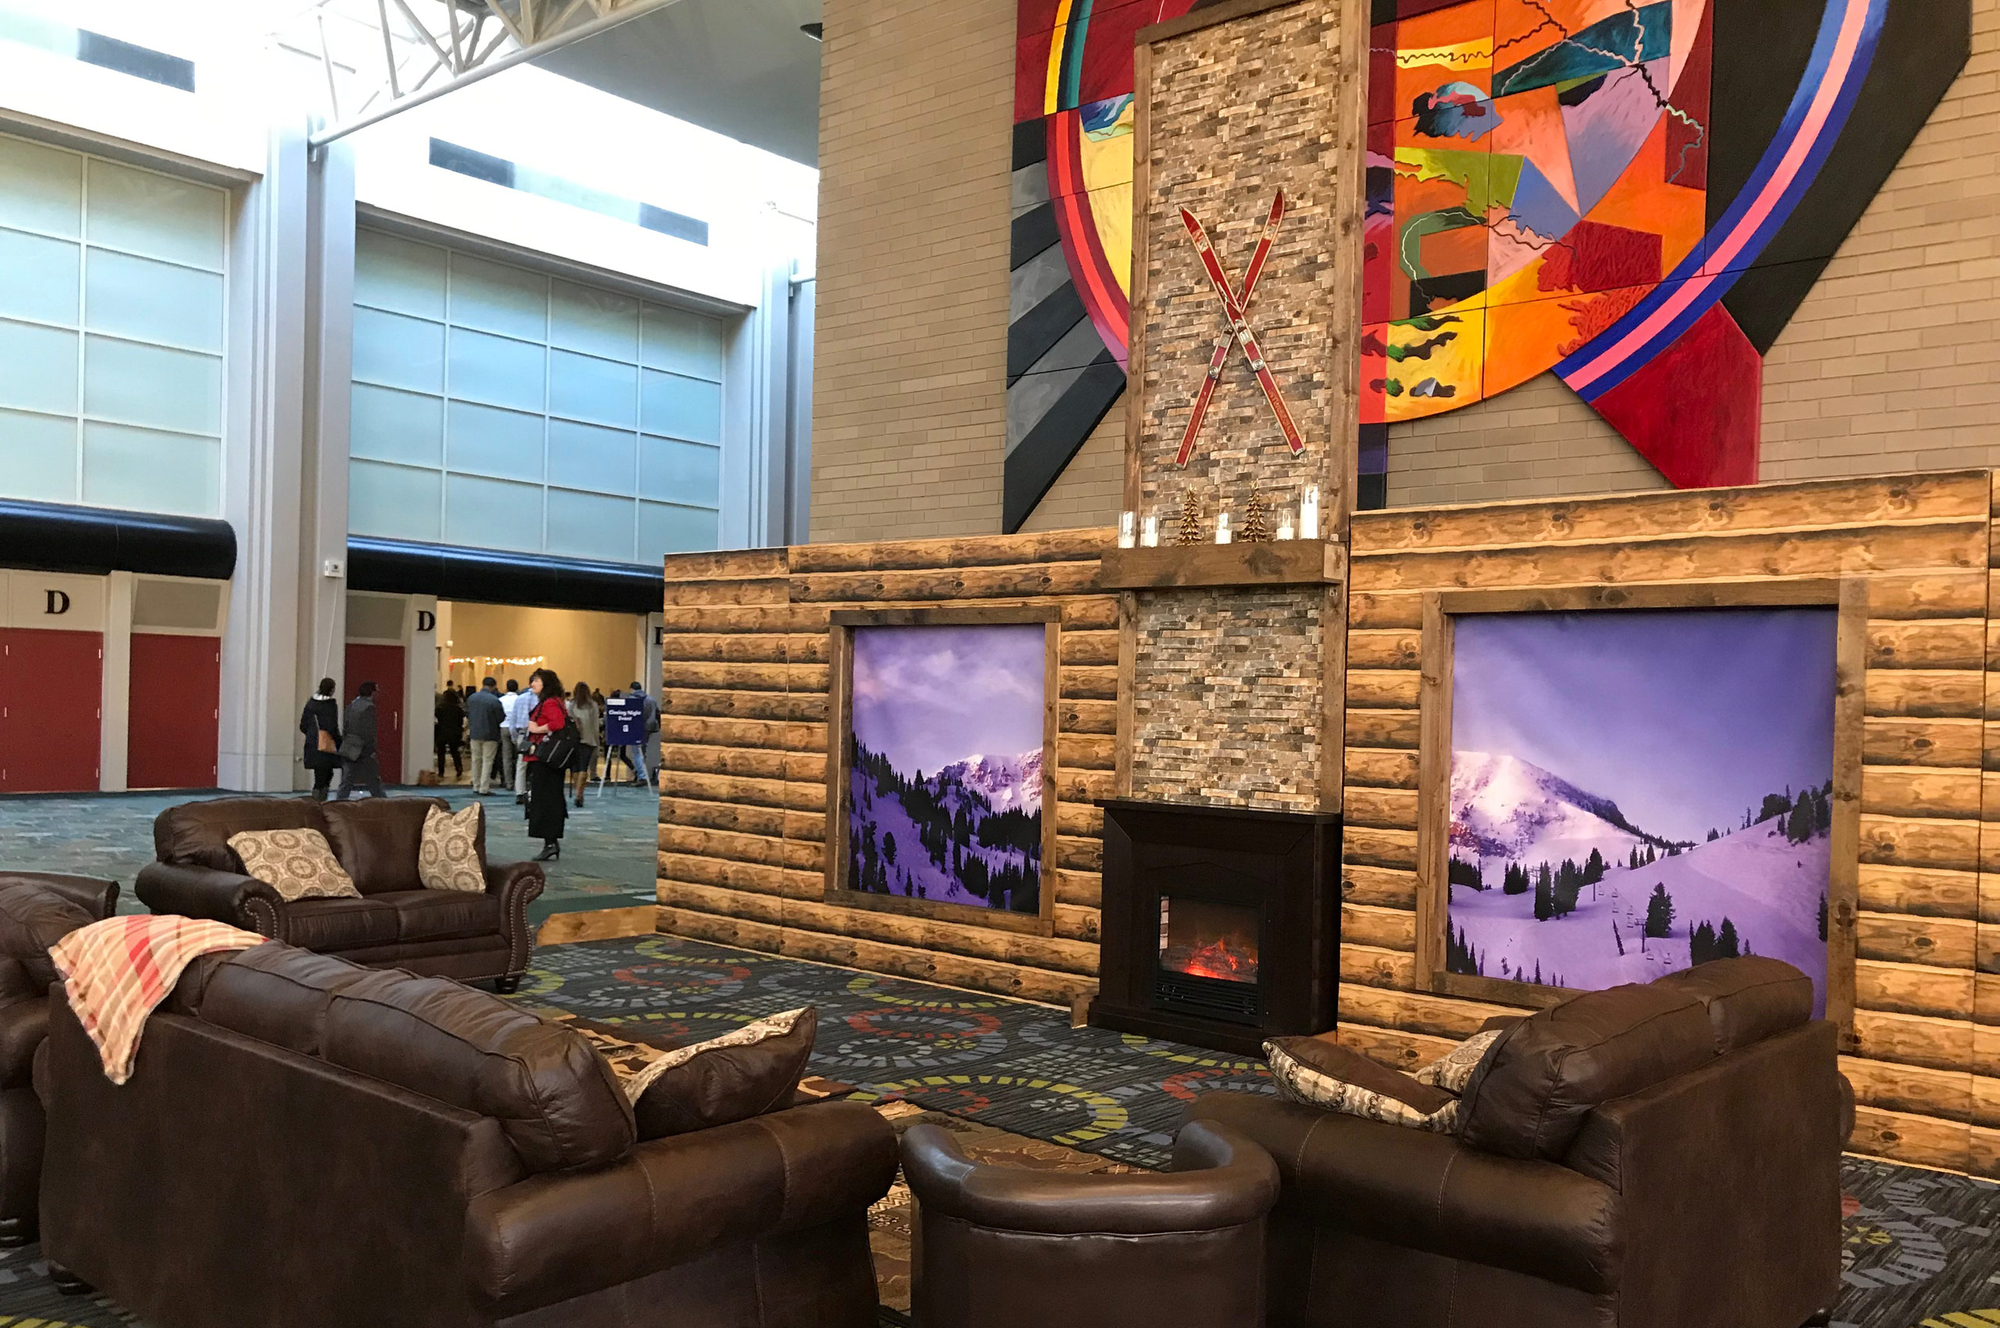 Higher_Education_User_Group_2018_Salt_Palace_Convention_Center_Ski_Cabin.jpg